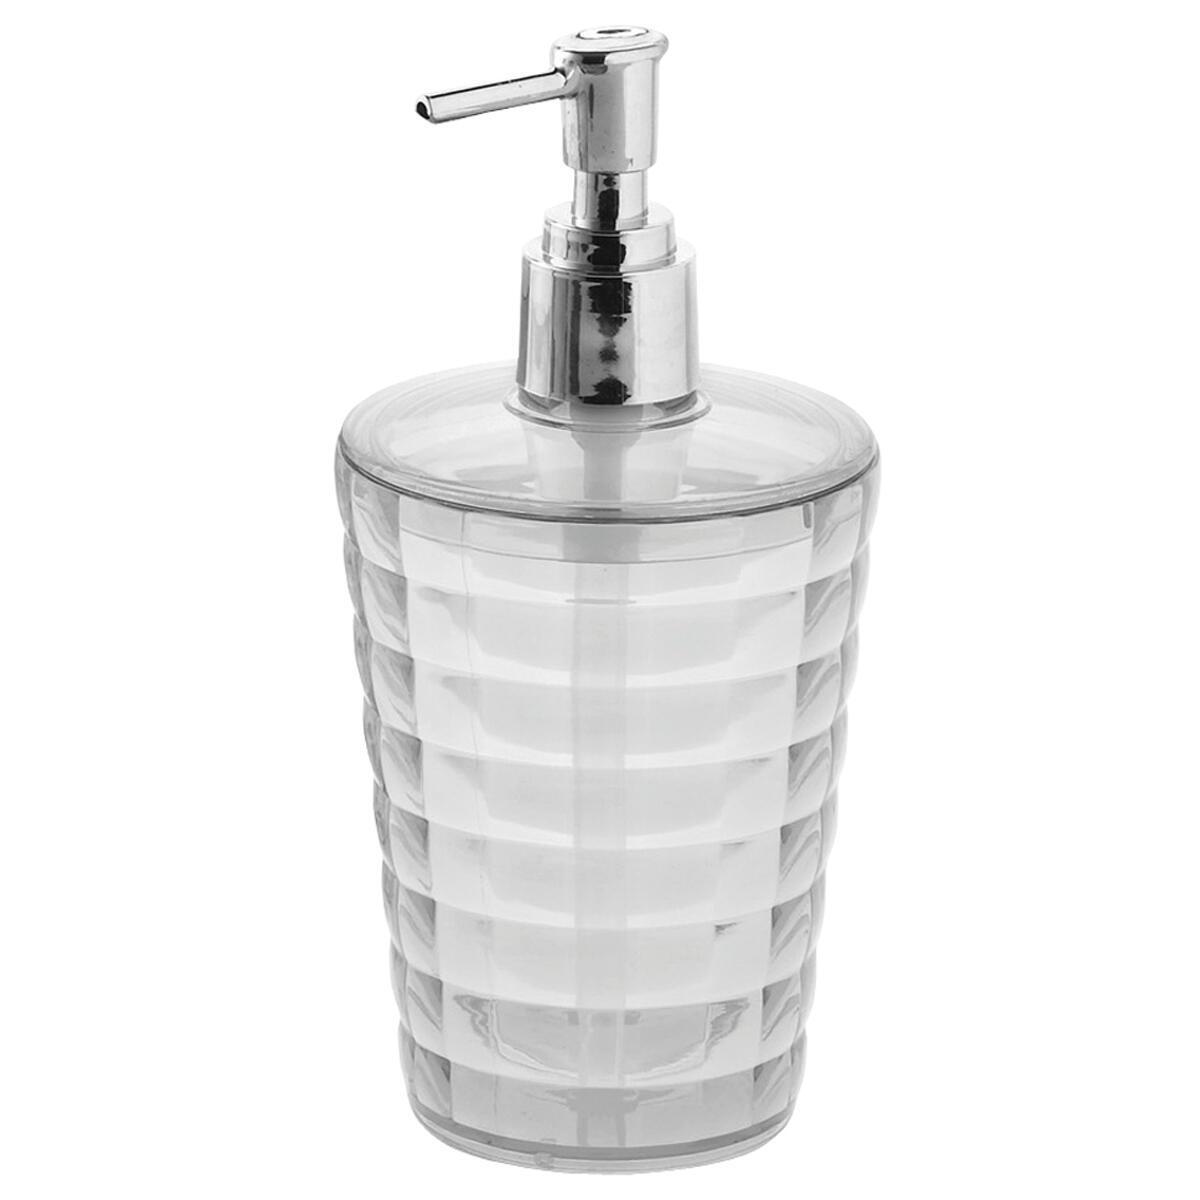 Dispenser sapone Glady trasparente